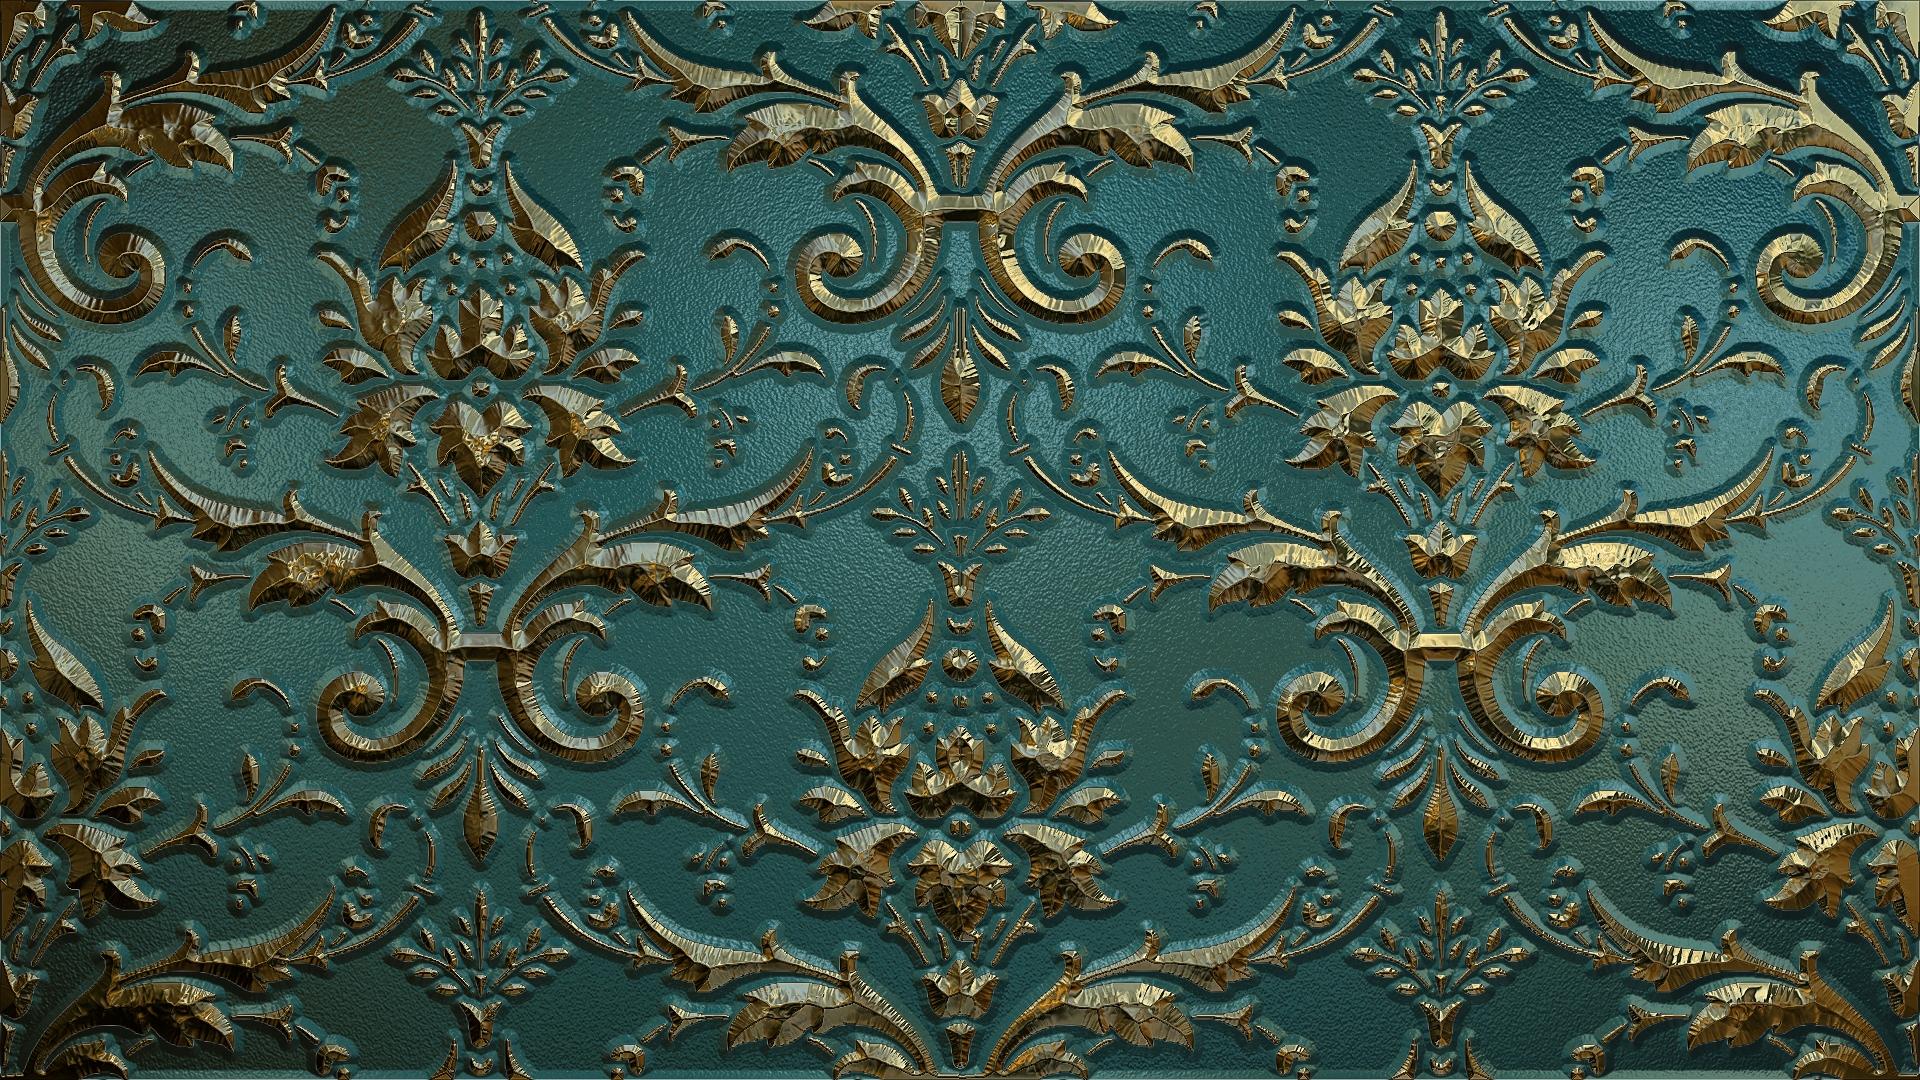 орнамент, узоры, текстура